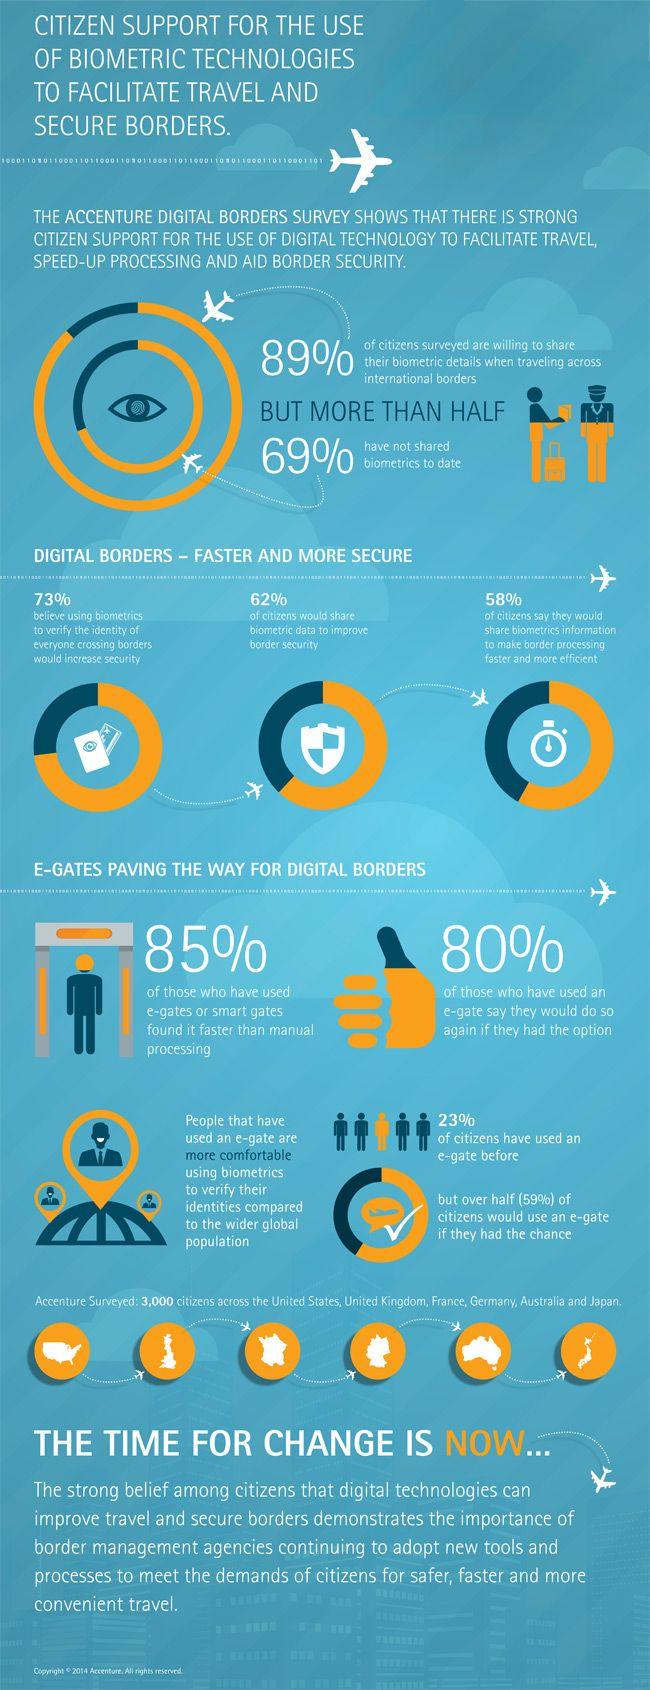 Digital Borders Survey - Infographic - Accenture